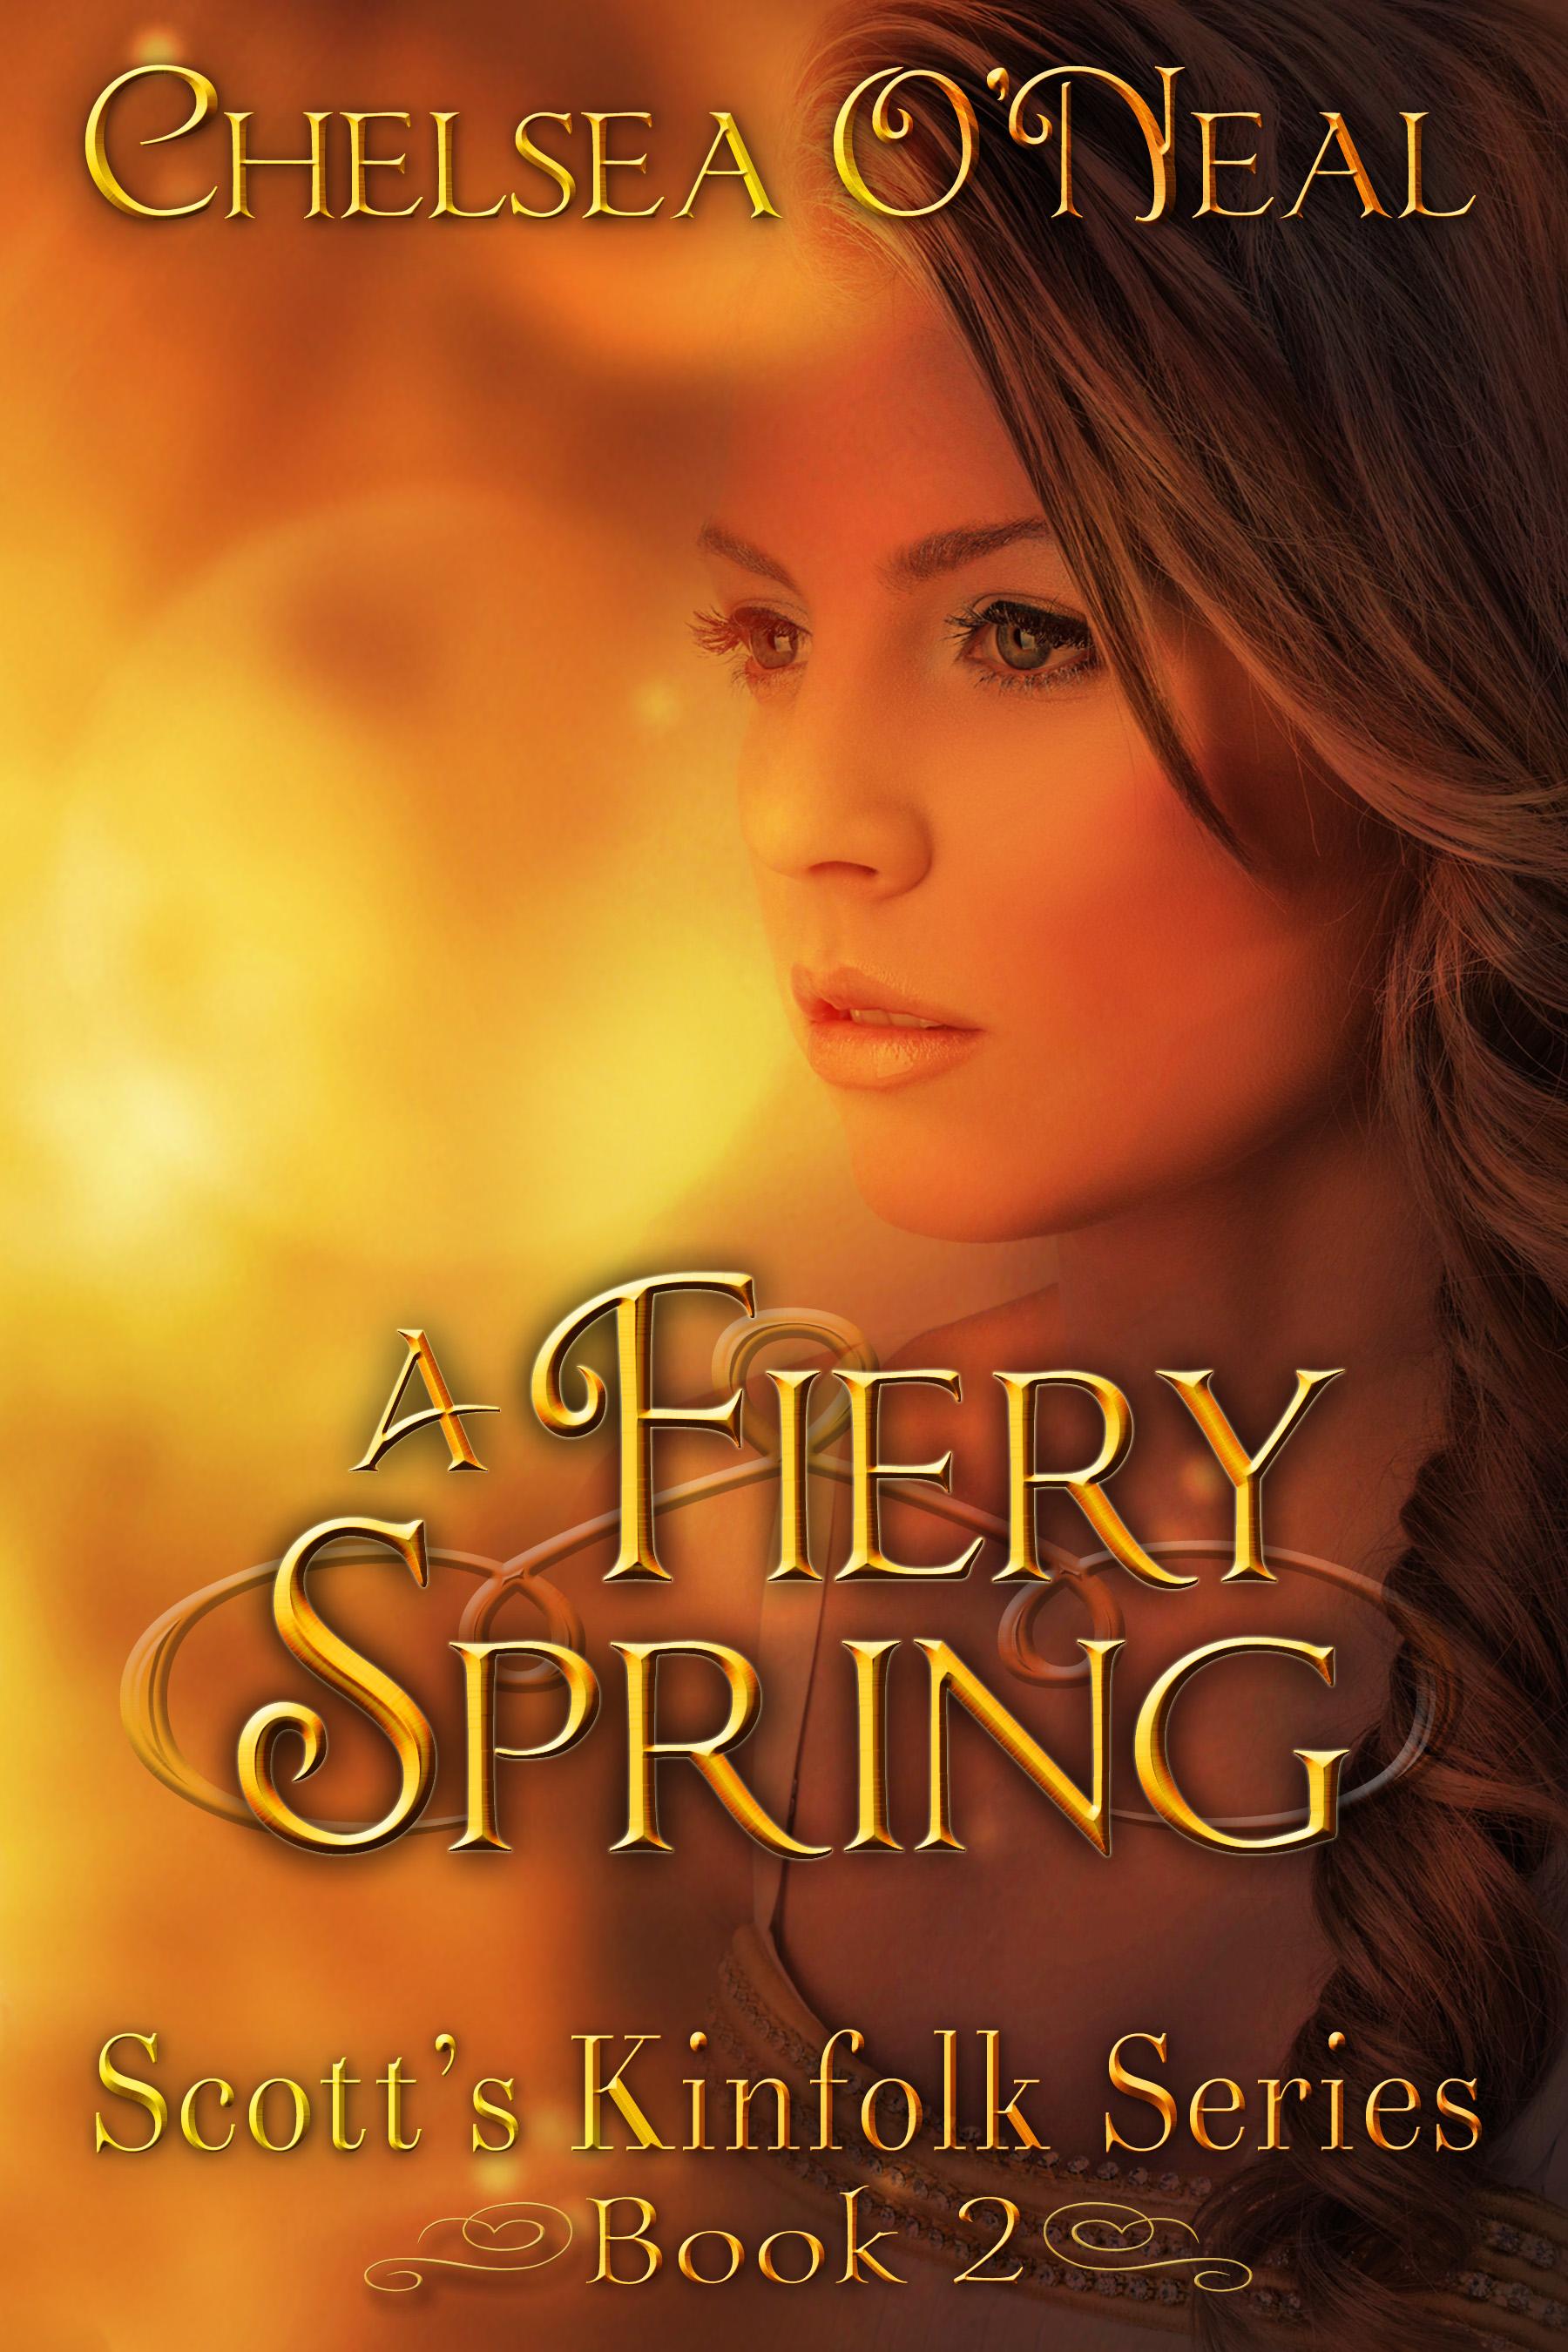 A Fiery Spring Scott's Kinfolk Saga Novella 2, an Ebook by Chelsea O'Neal